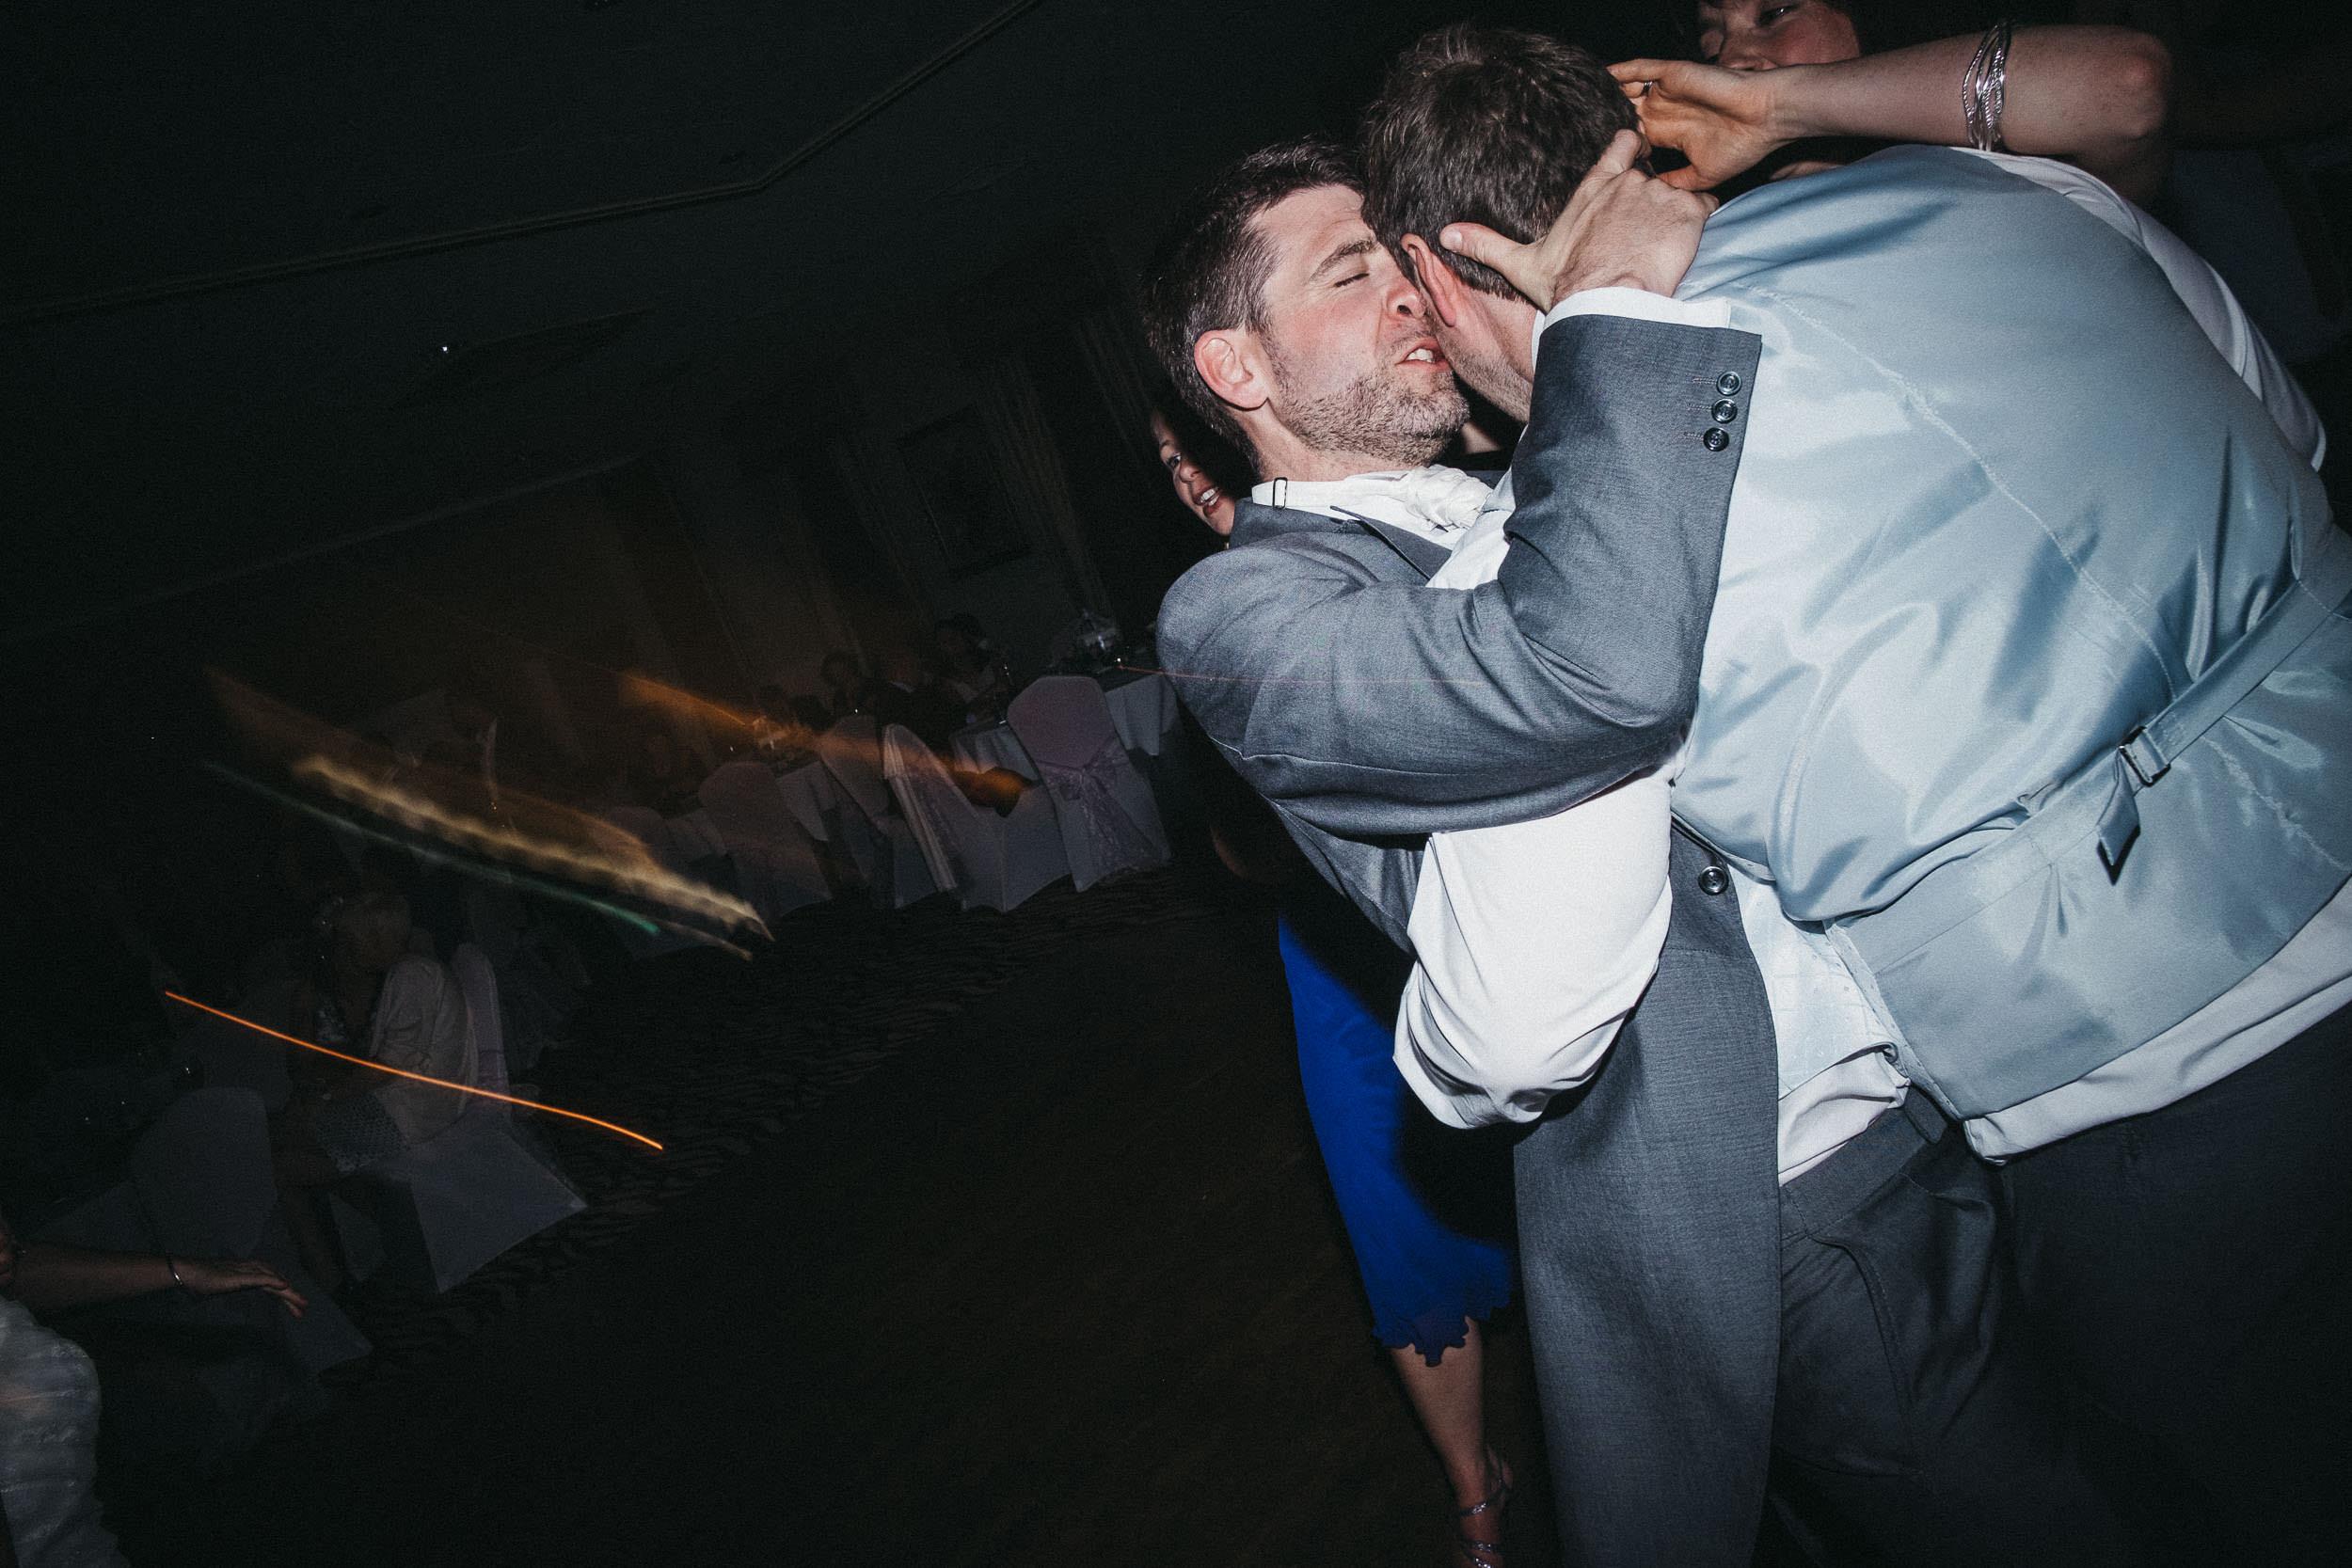 Groomsman kisses groom on dance floor